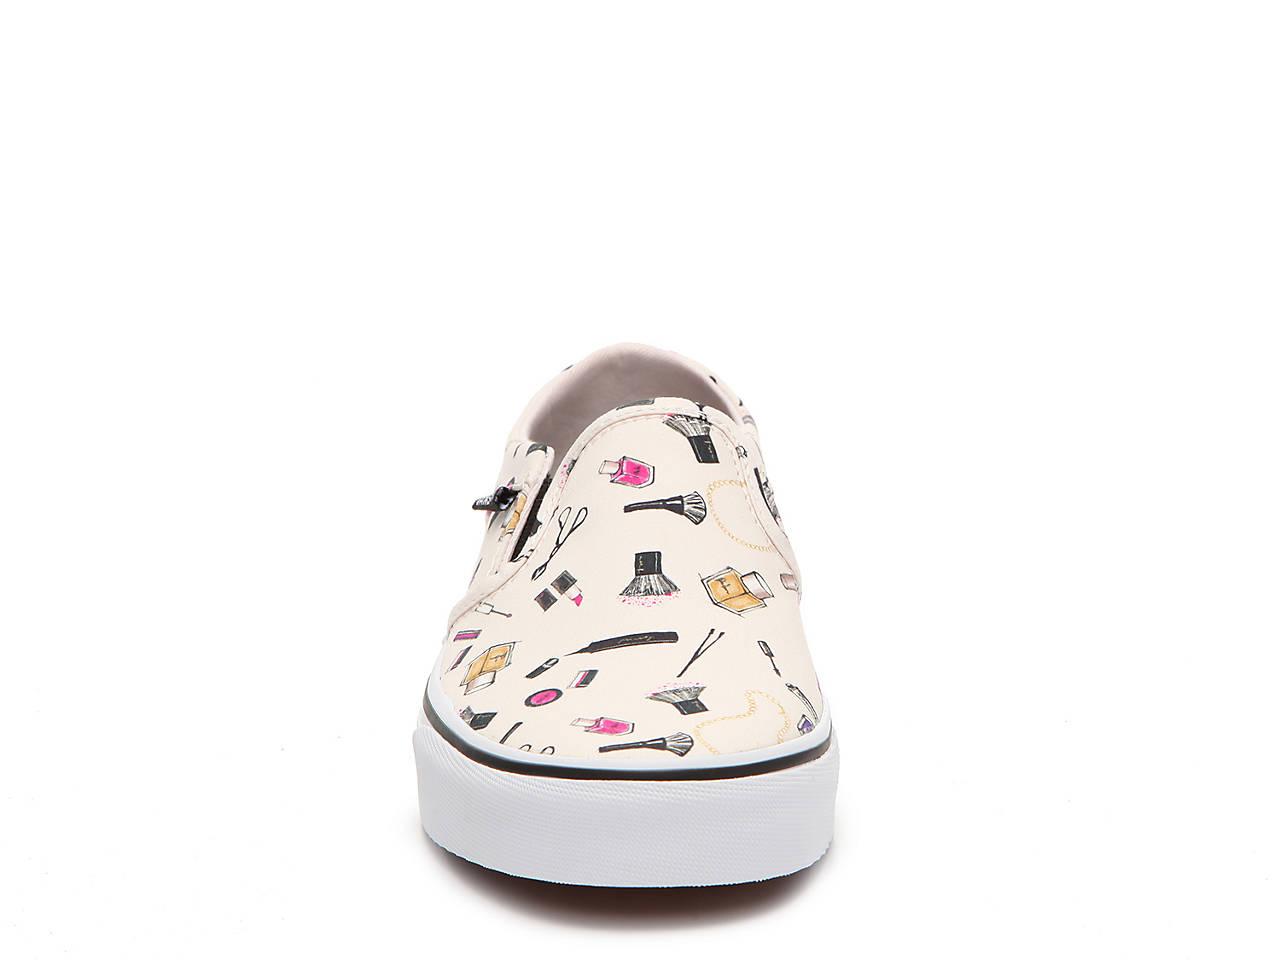 Vans Asher Make Up Shoes 05R8hhfgH